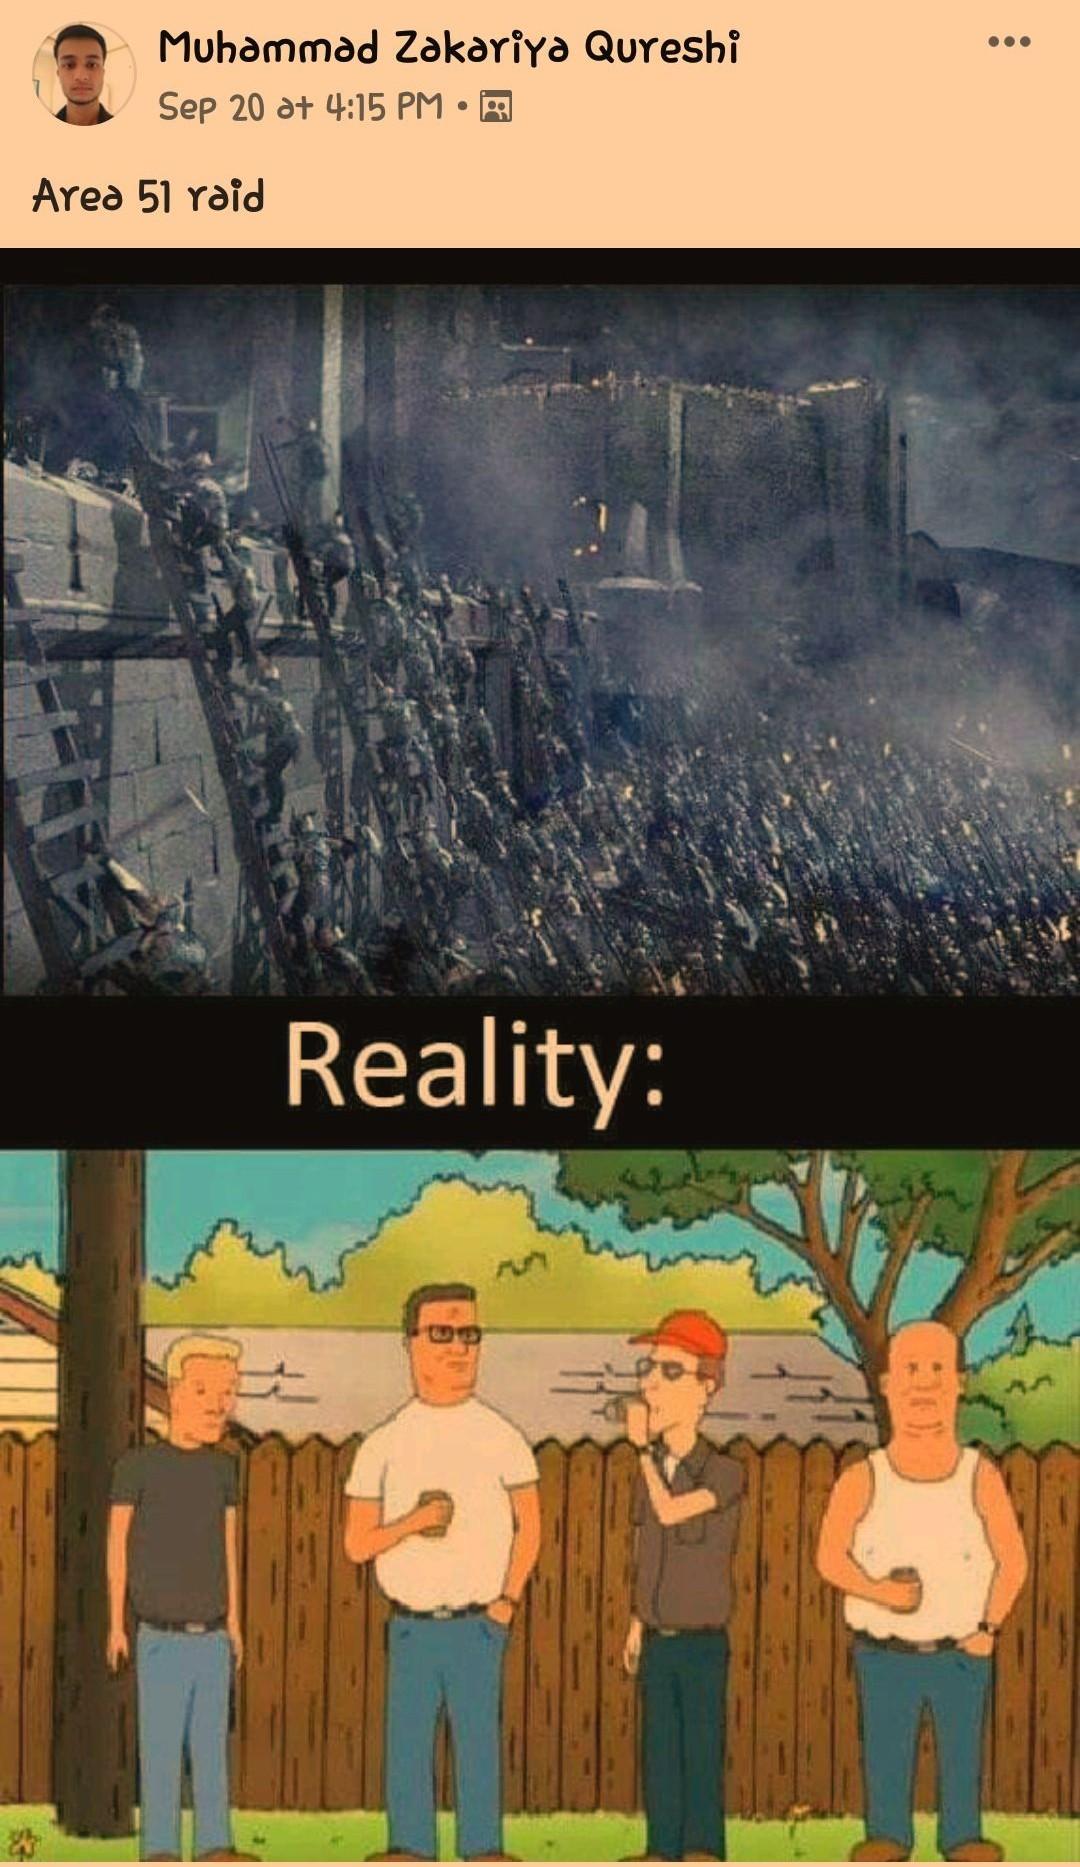 Area 51 raid - Meme by SlenderJack07 :) Memedroid